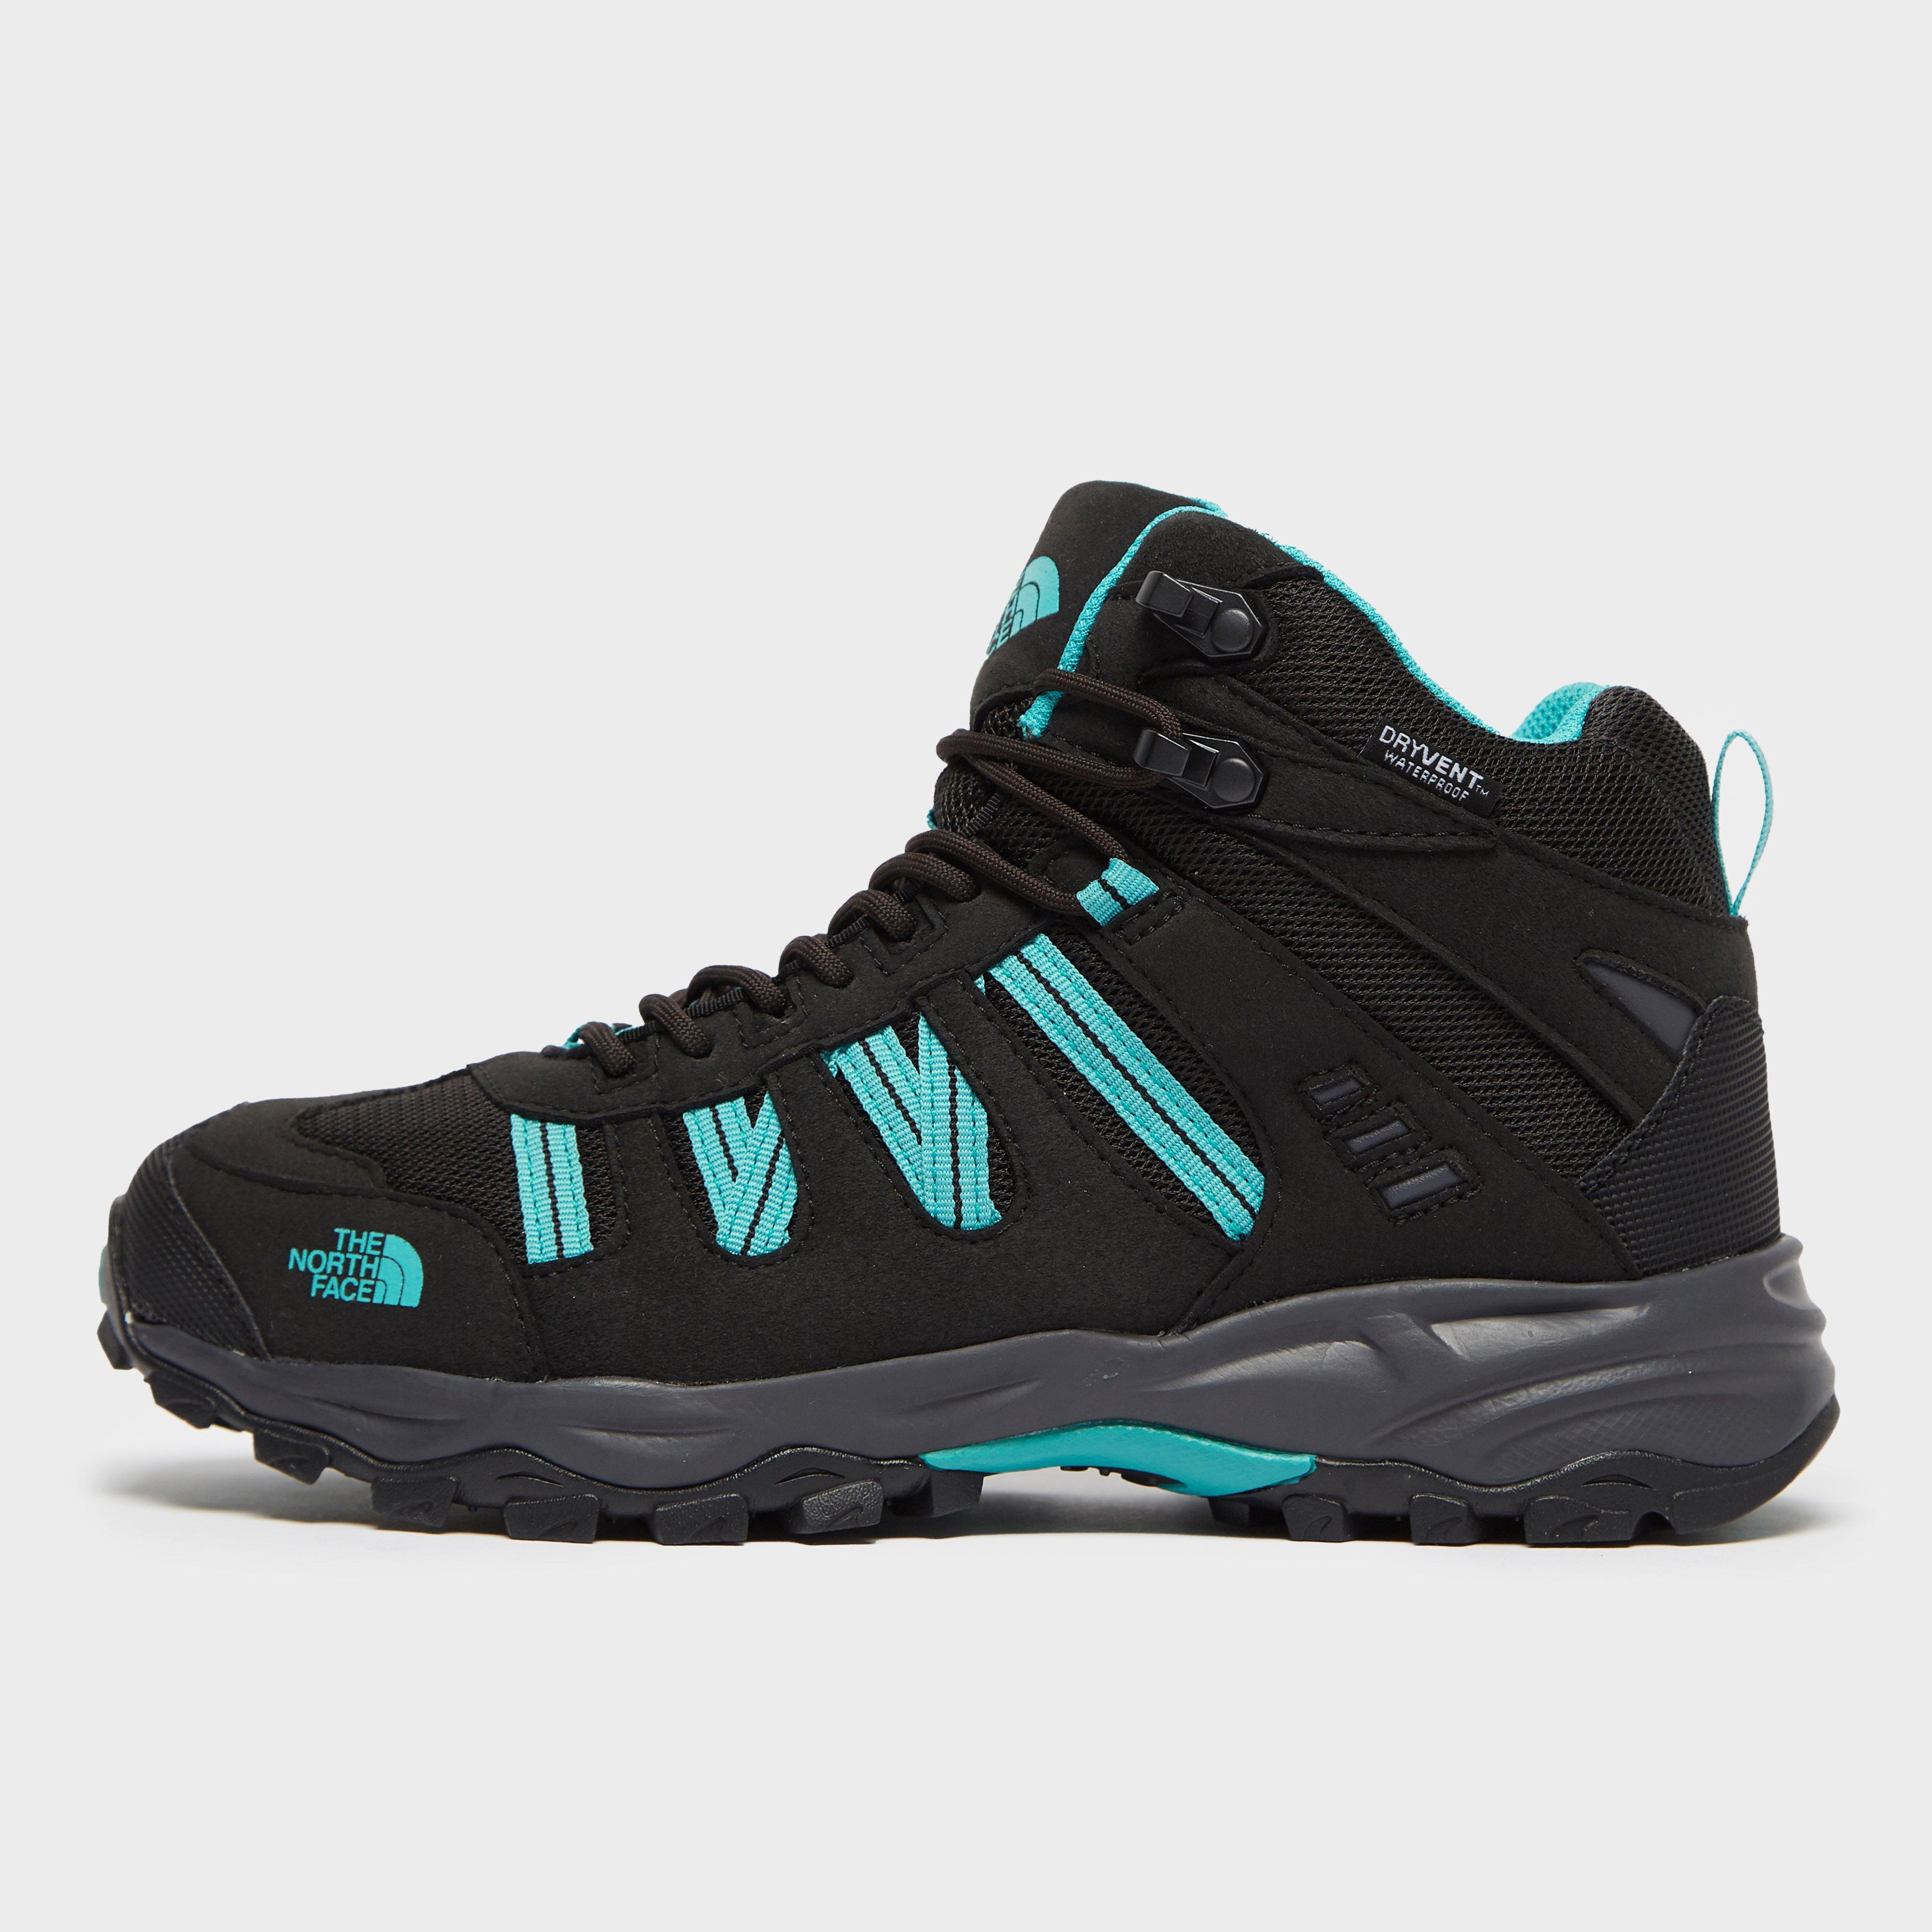 The North Face Women's Sakura Hiking Boot - Black/Blk$, Black